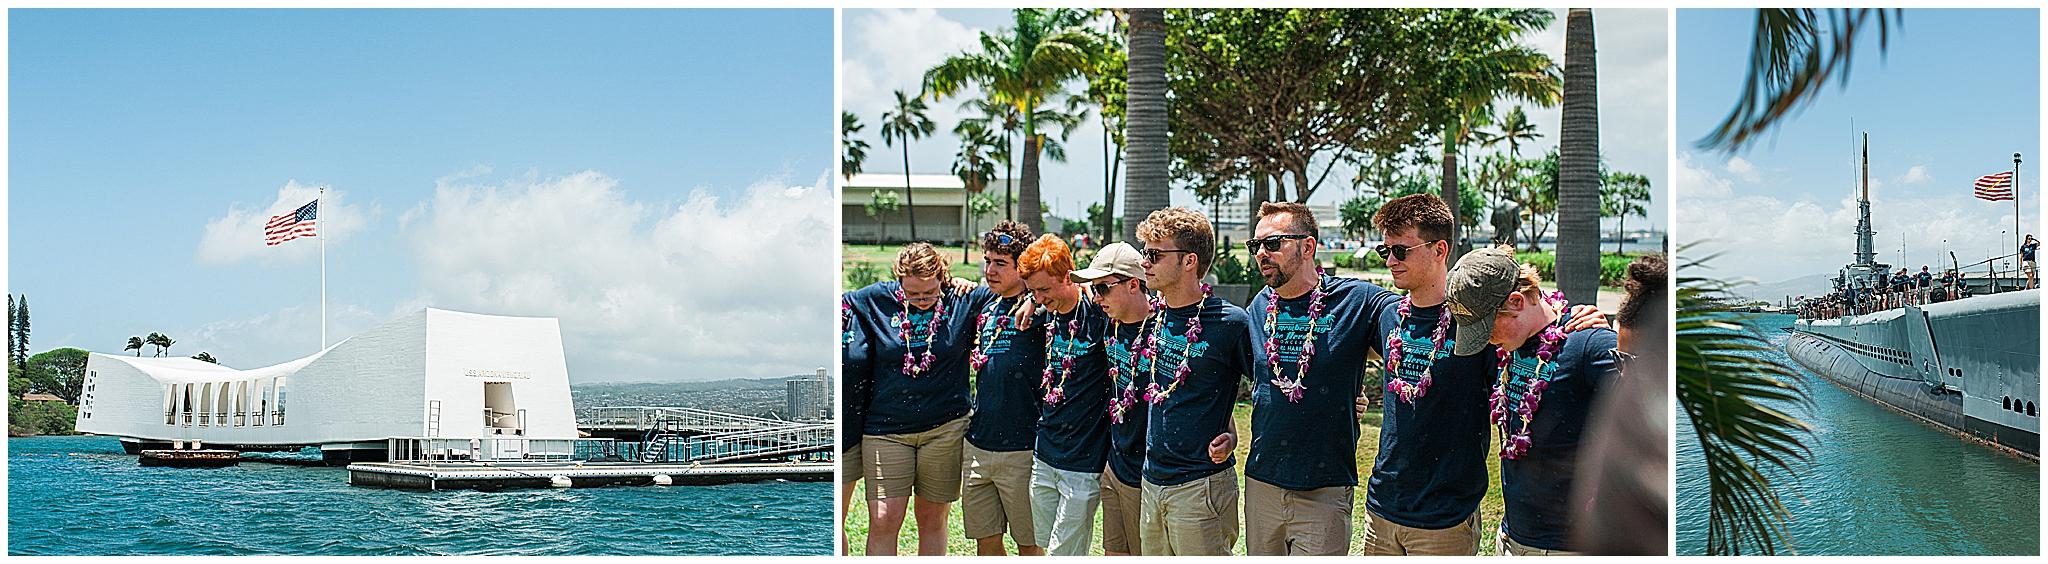 TCR_Hawaii_2019_0014.jpg